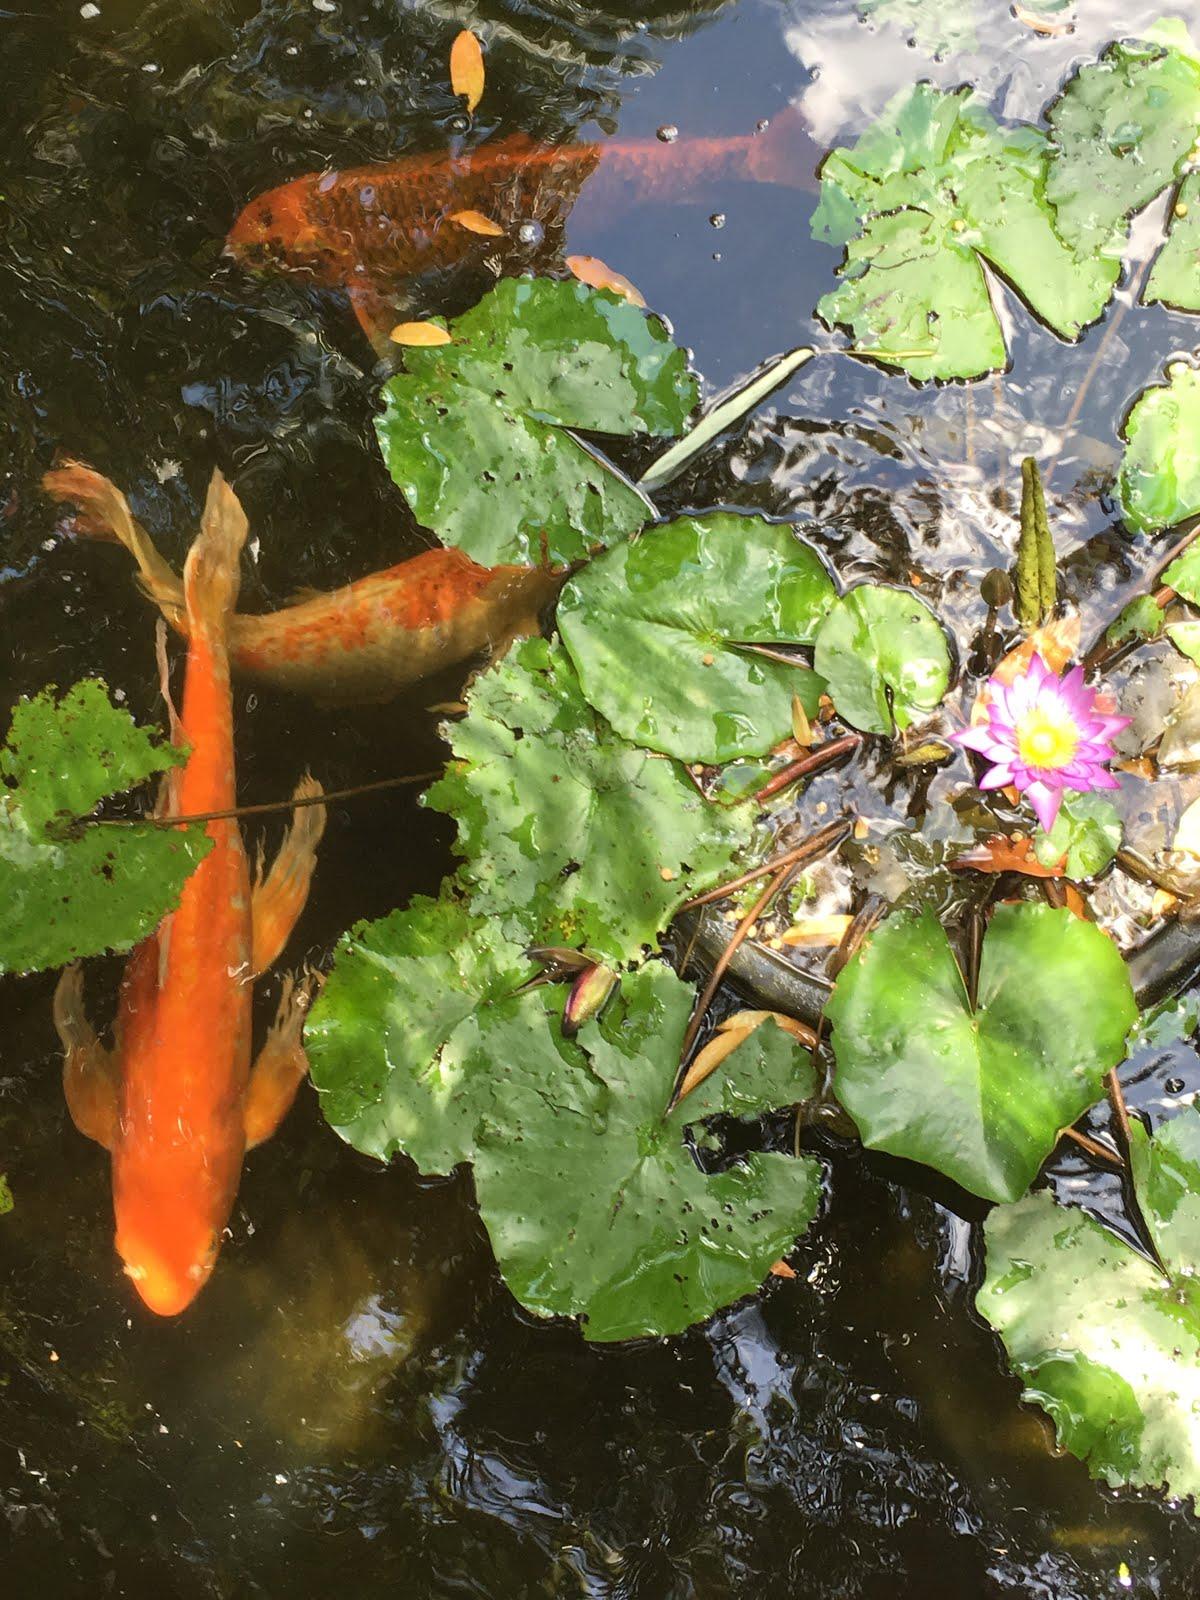 Swim in Peace